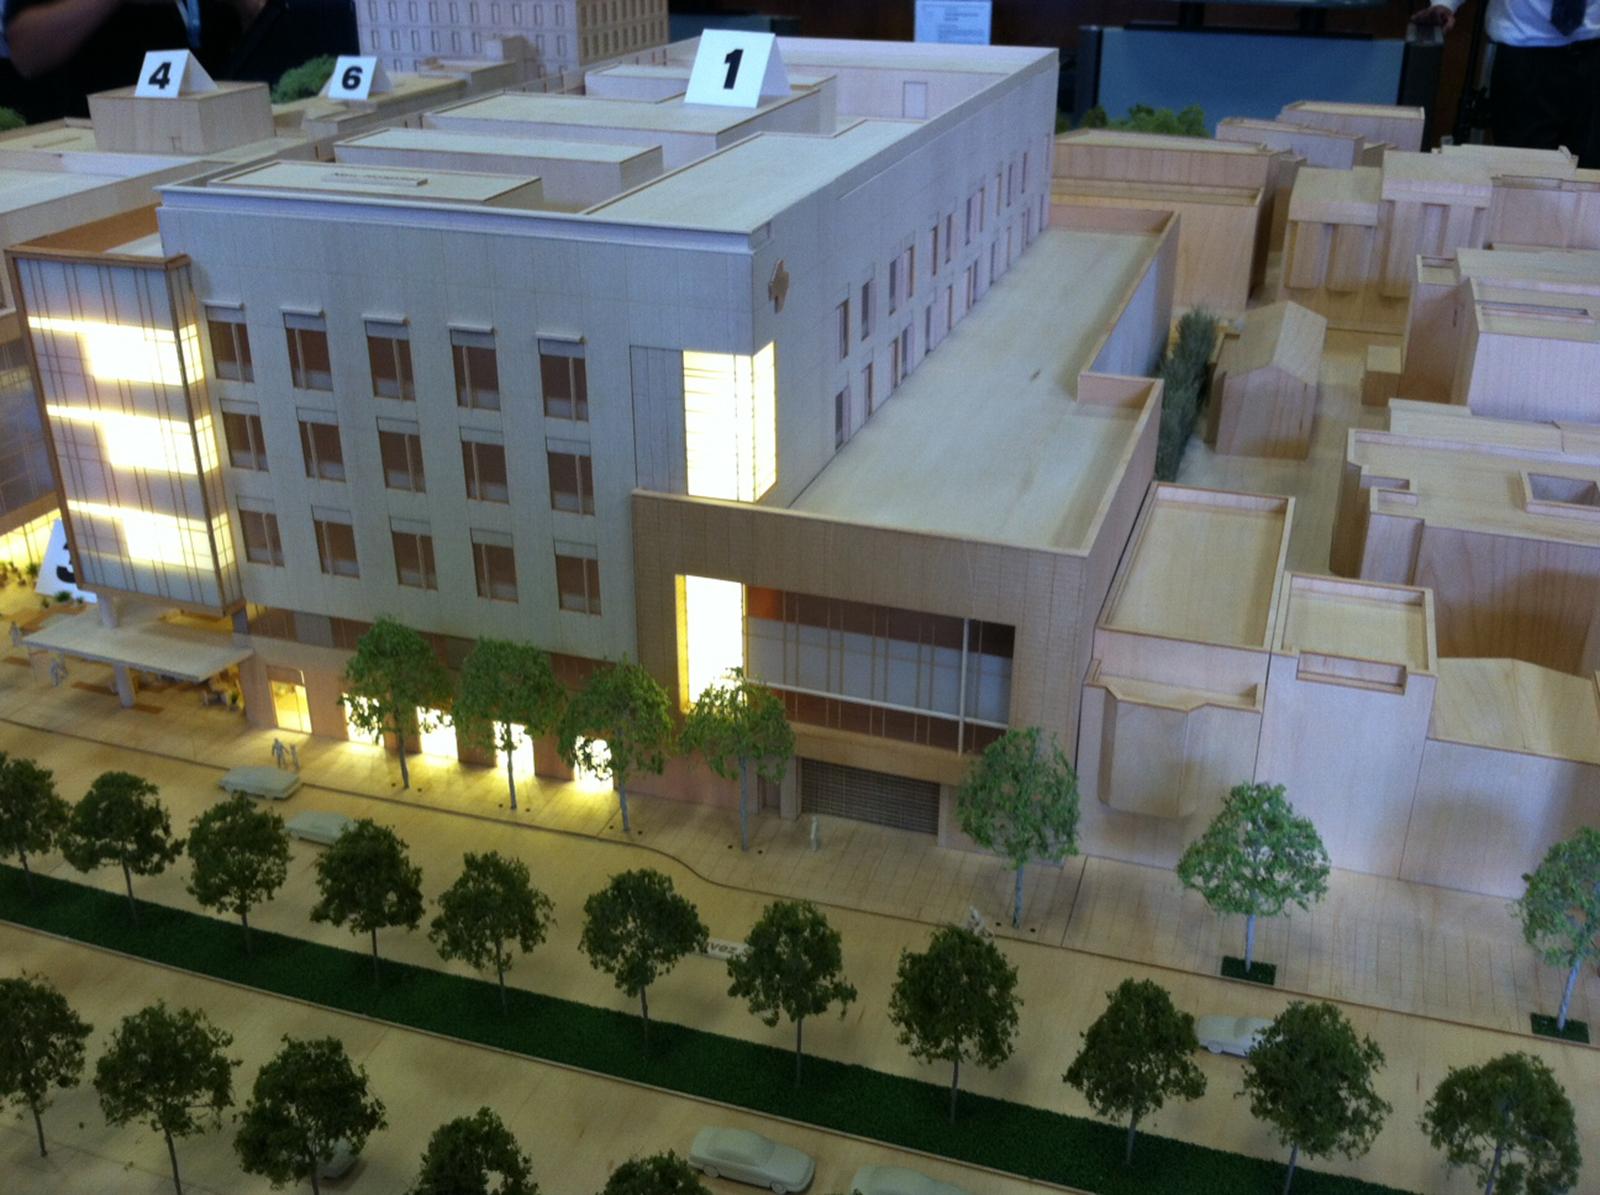 A model of a new plan to rebuild St. Luke's hospital on Cesar Chavez Street.